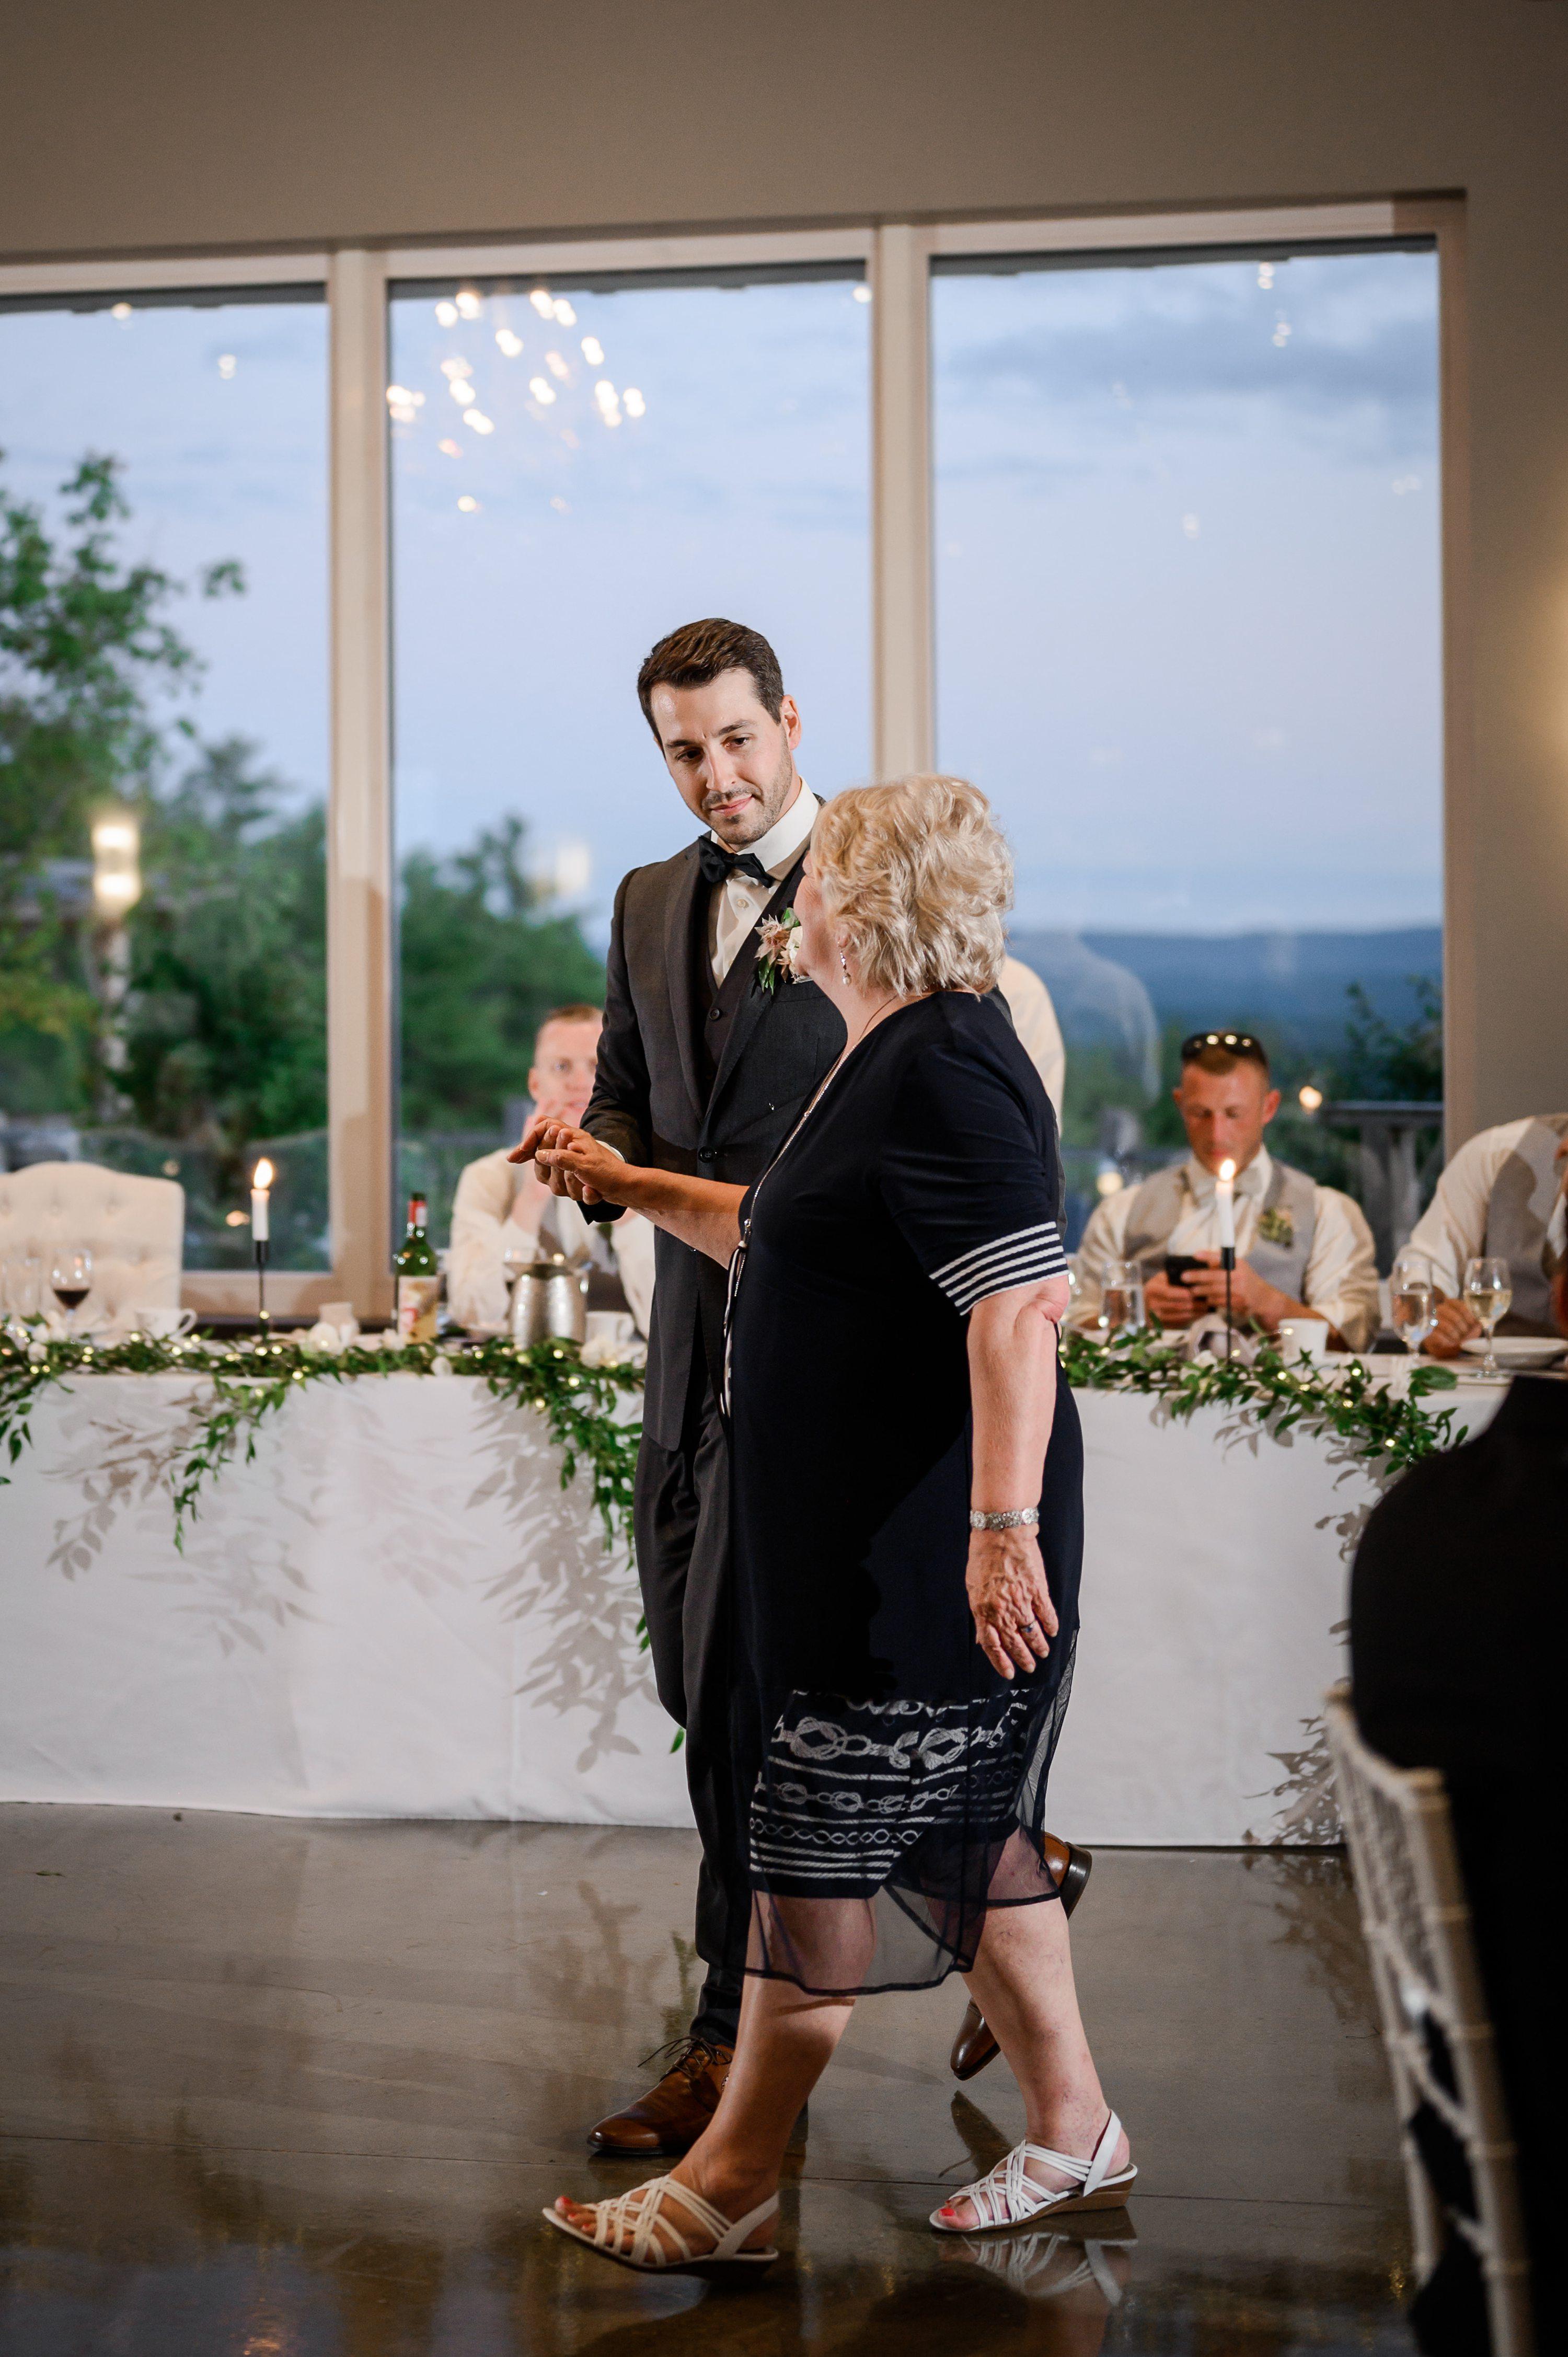 genevieve albert photographe,Photographe de mariage